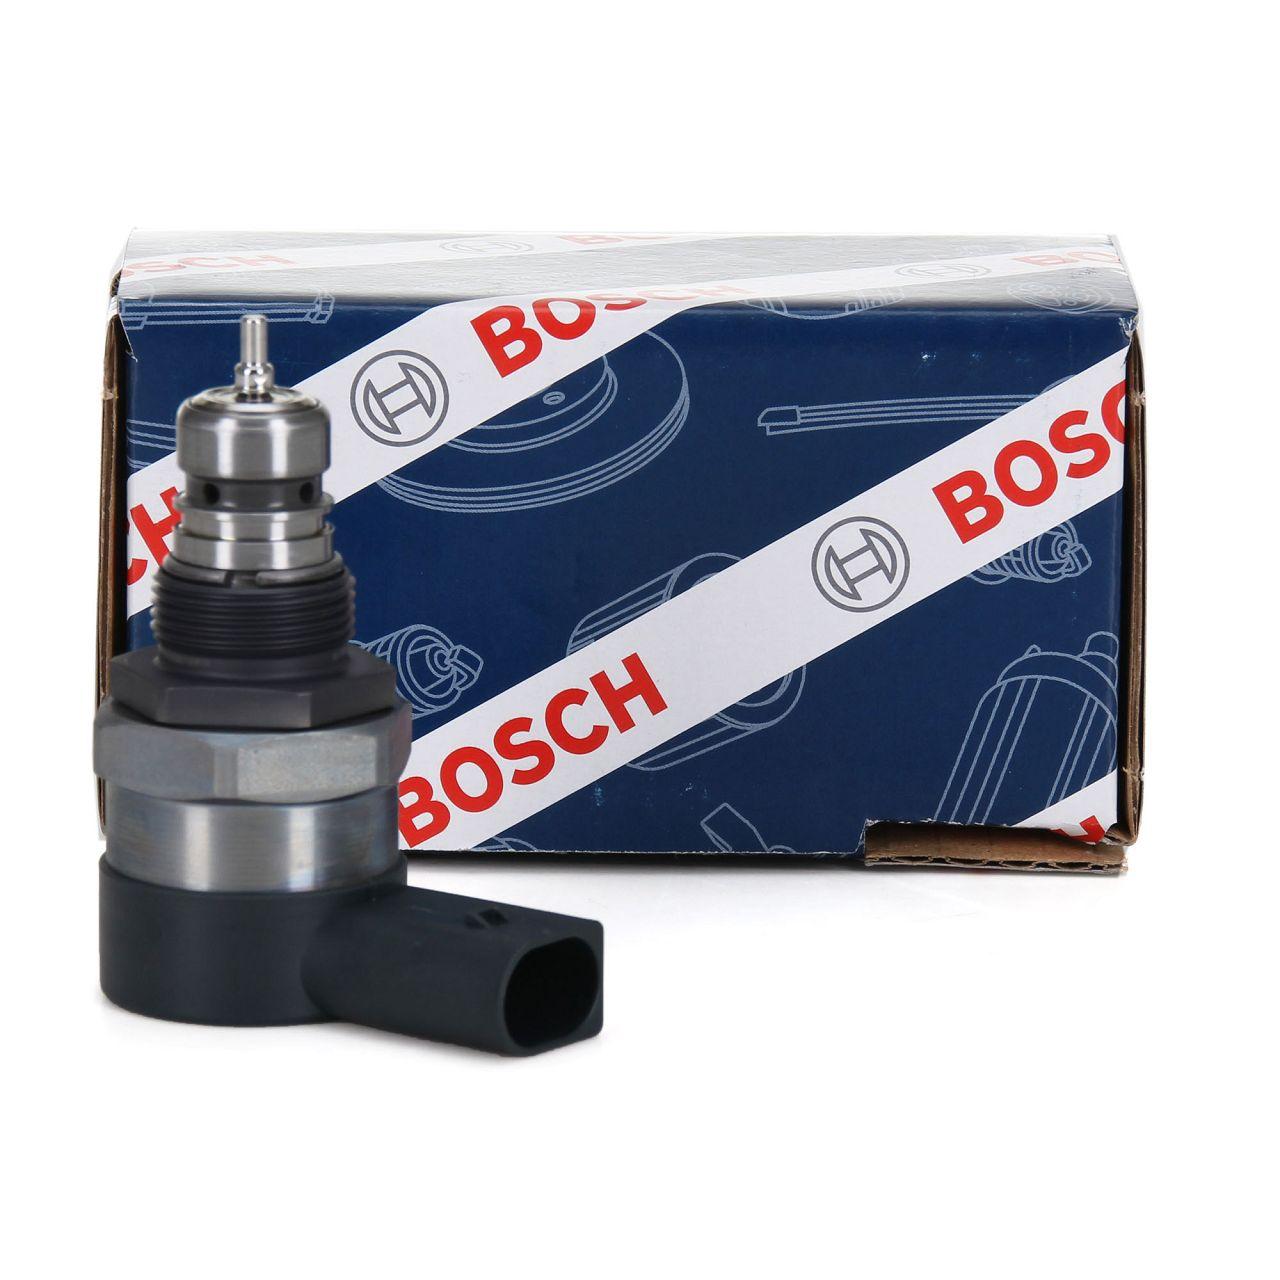 BOSCH Druckregelventil Druckregler CommonRail für AUDI SEAT SKODA VW 2.0 TDI